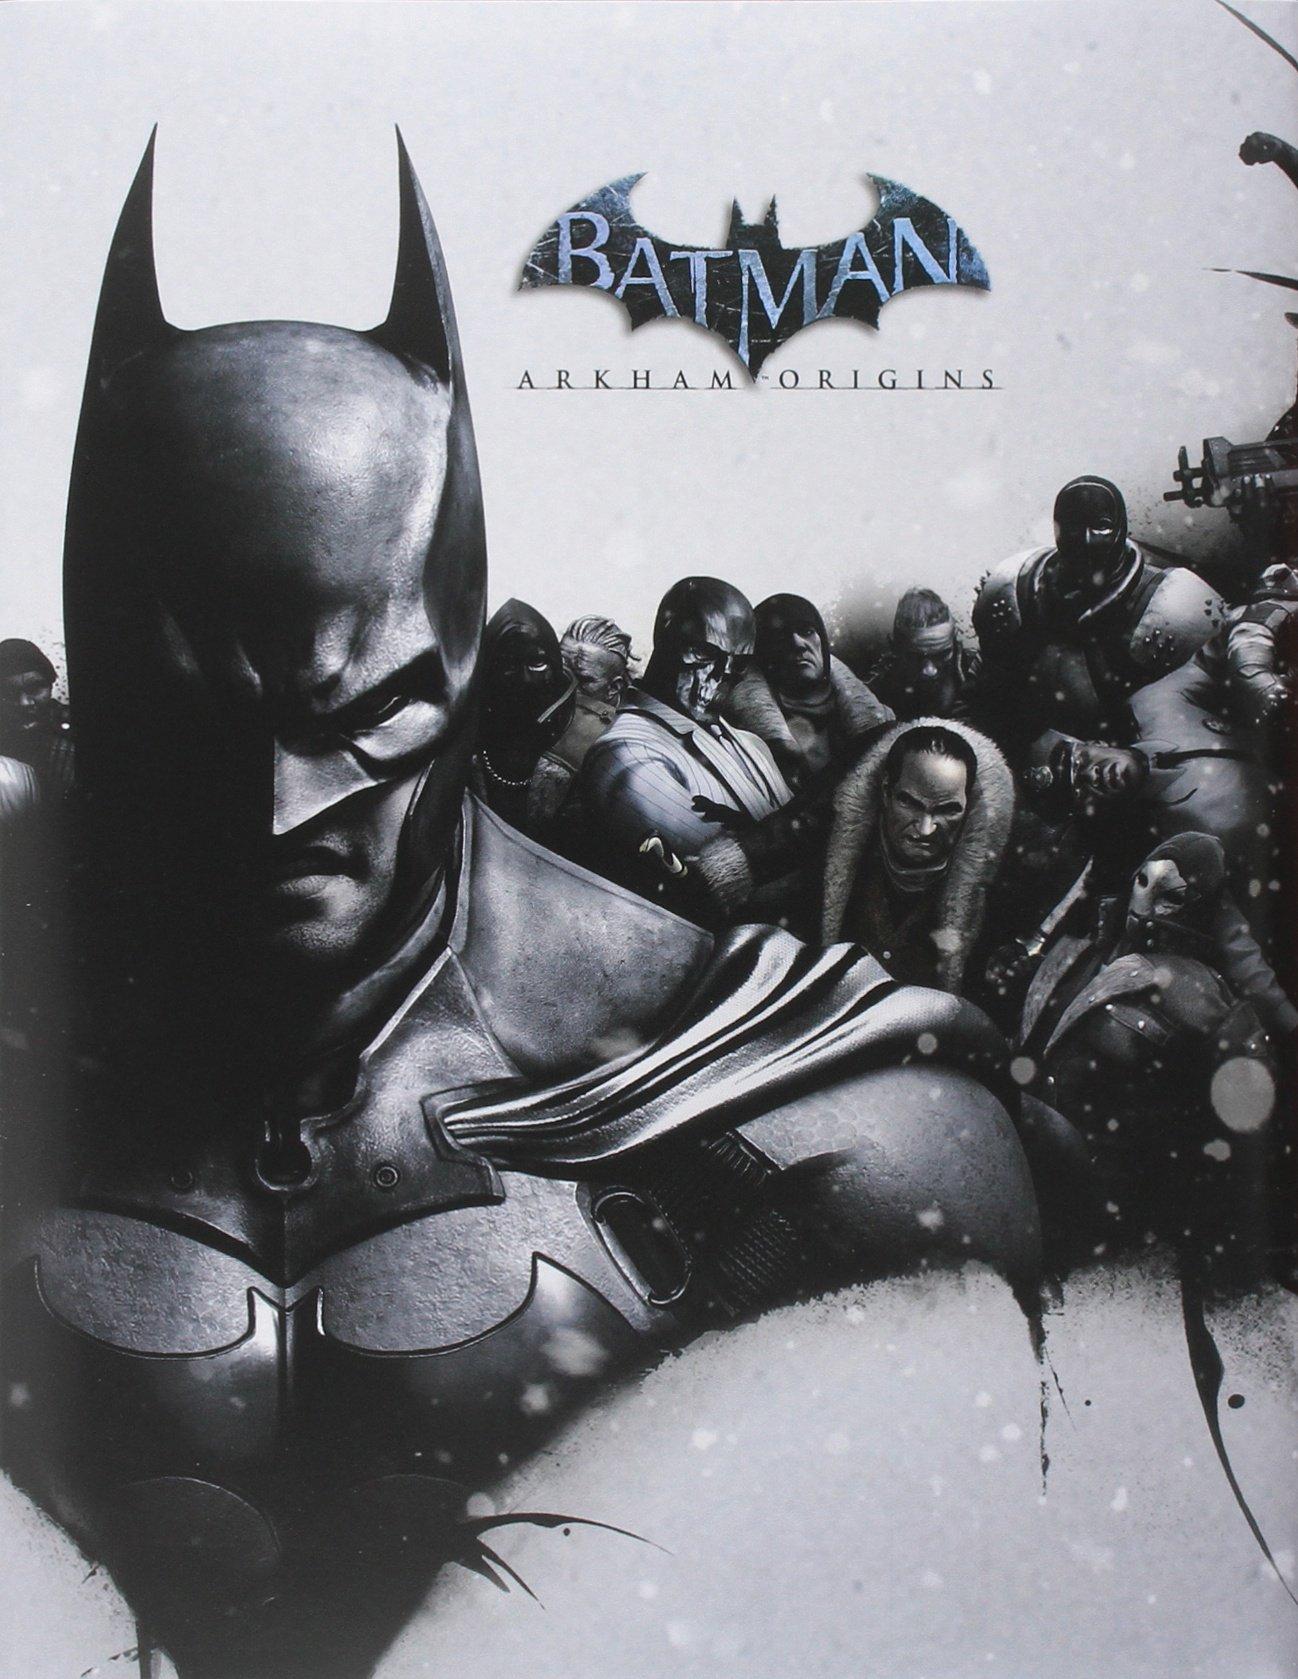 Batman arkham asylum walkthrough pdf download.